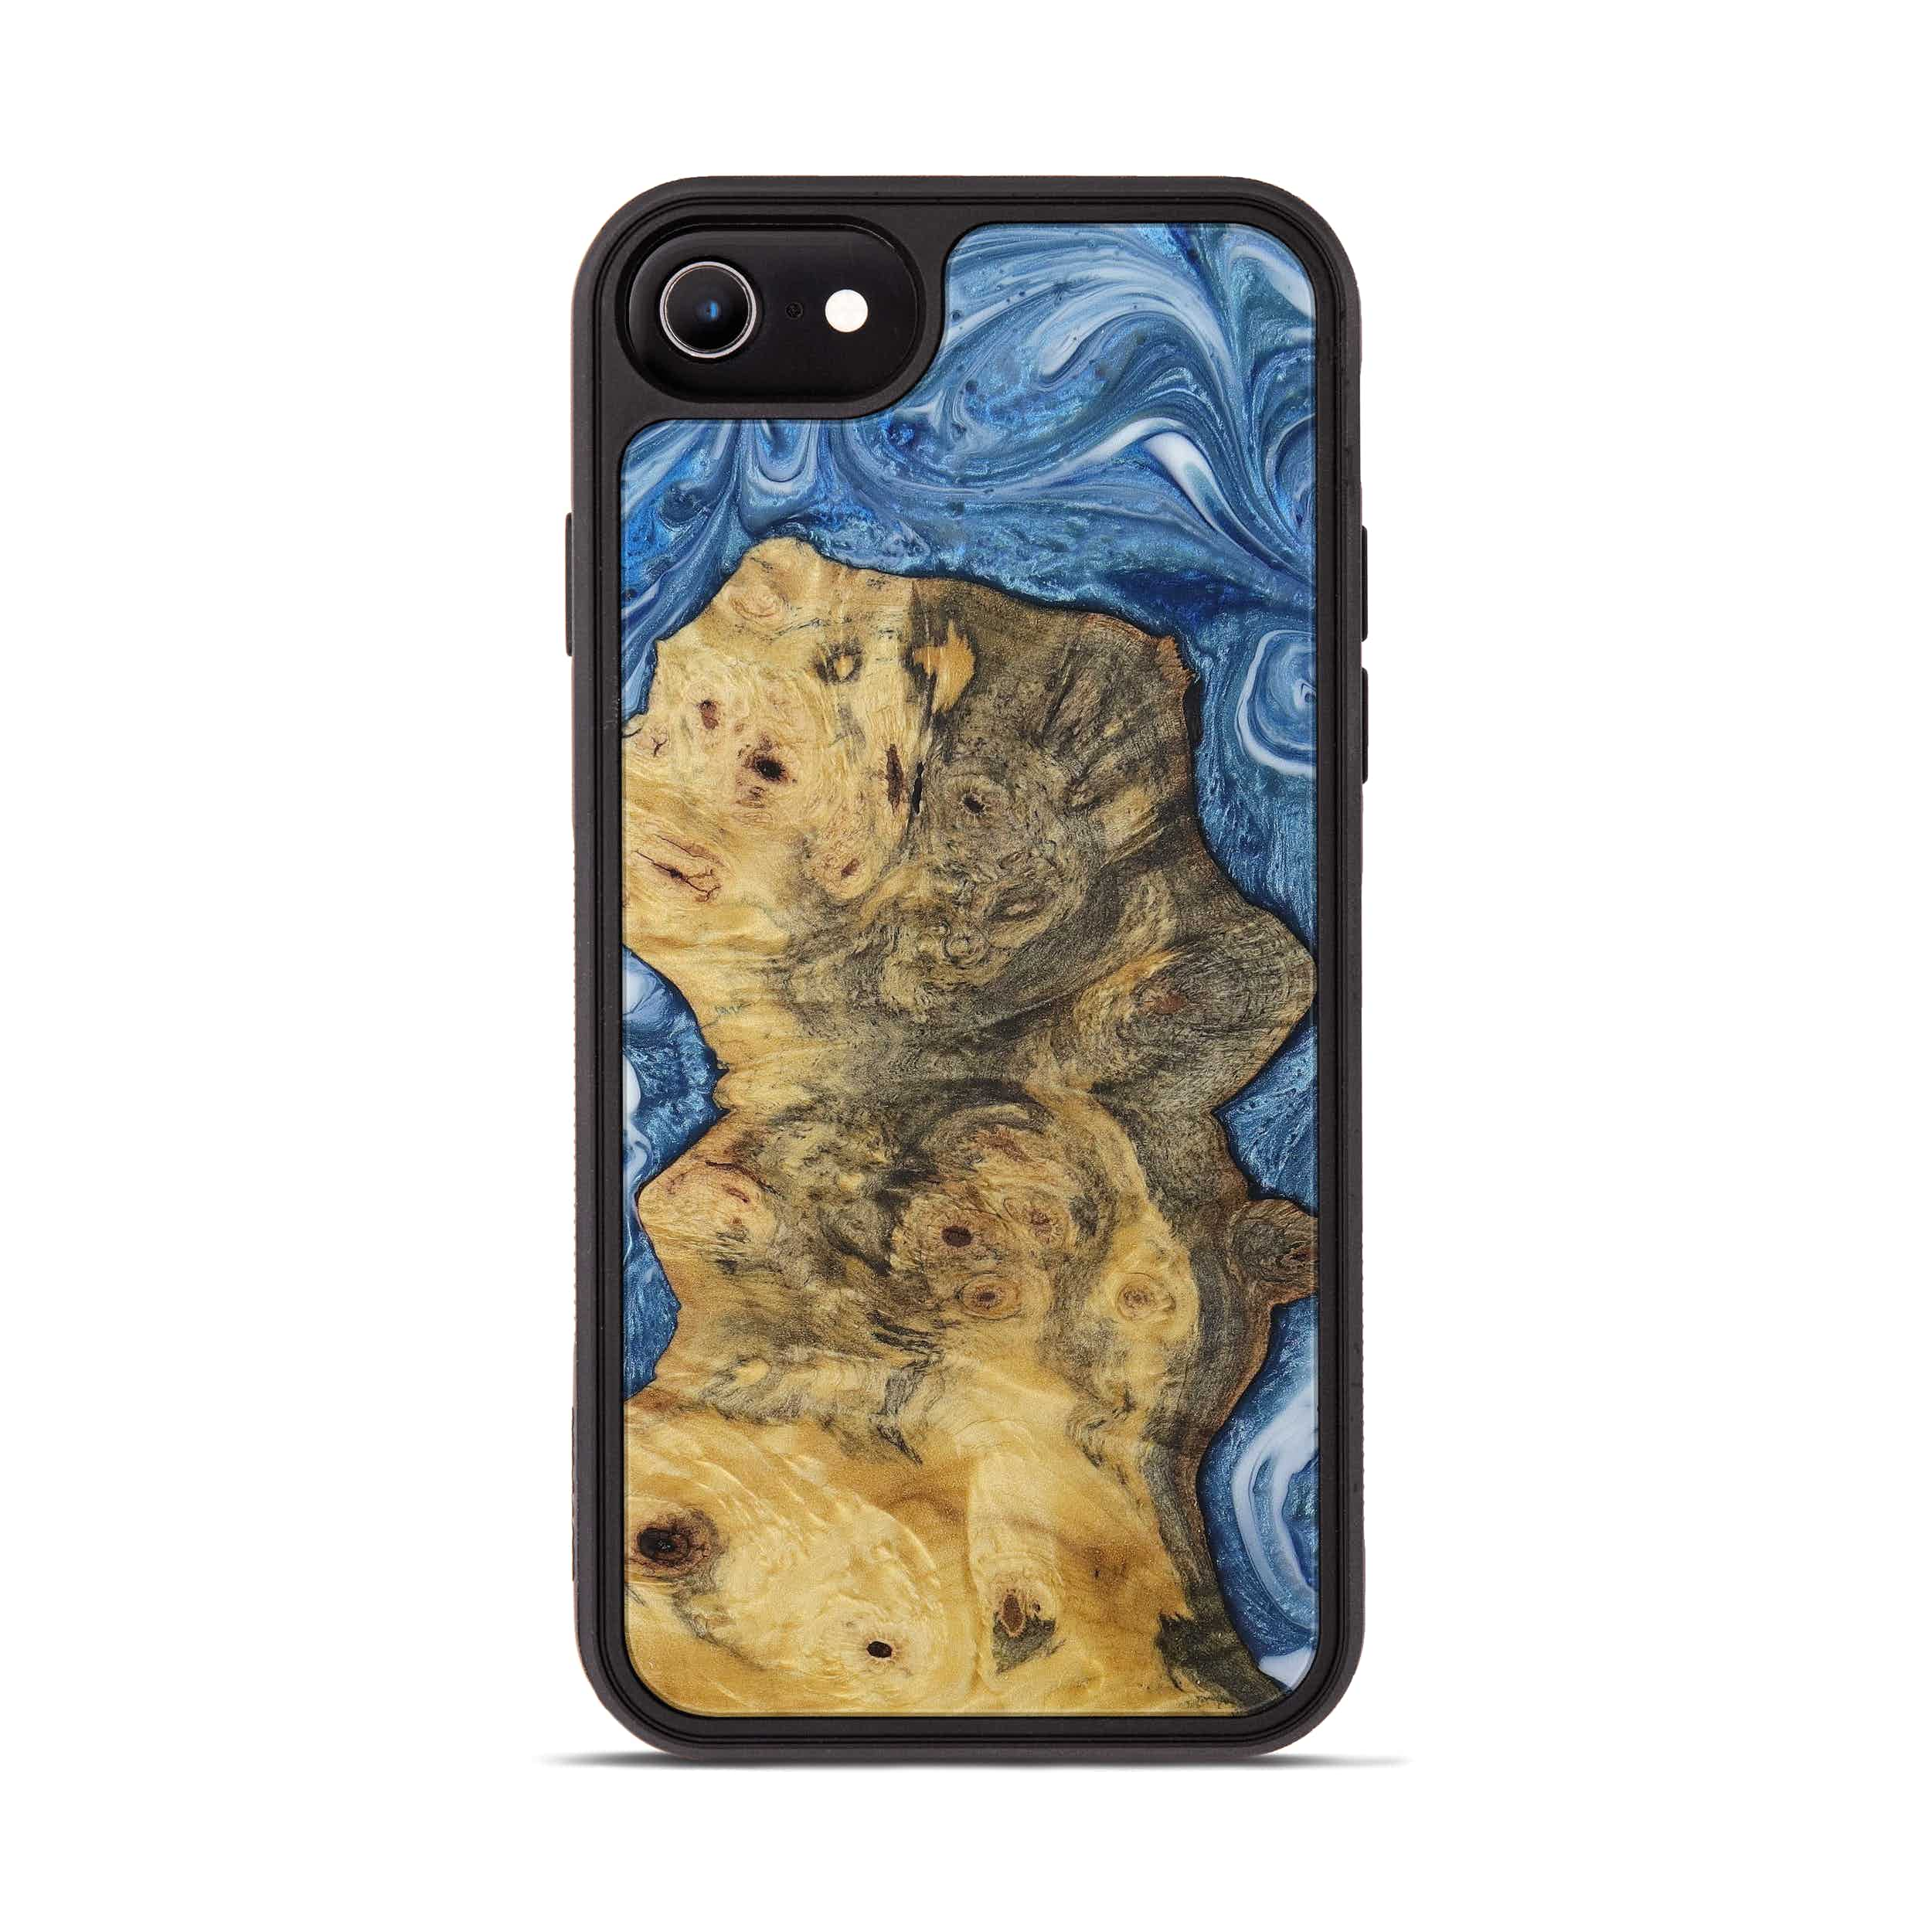 iPhone 7 Wood+Resin Phone Case - Gladys (Light Blue, 400173)